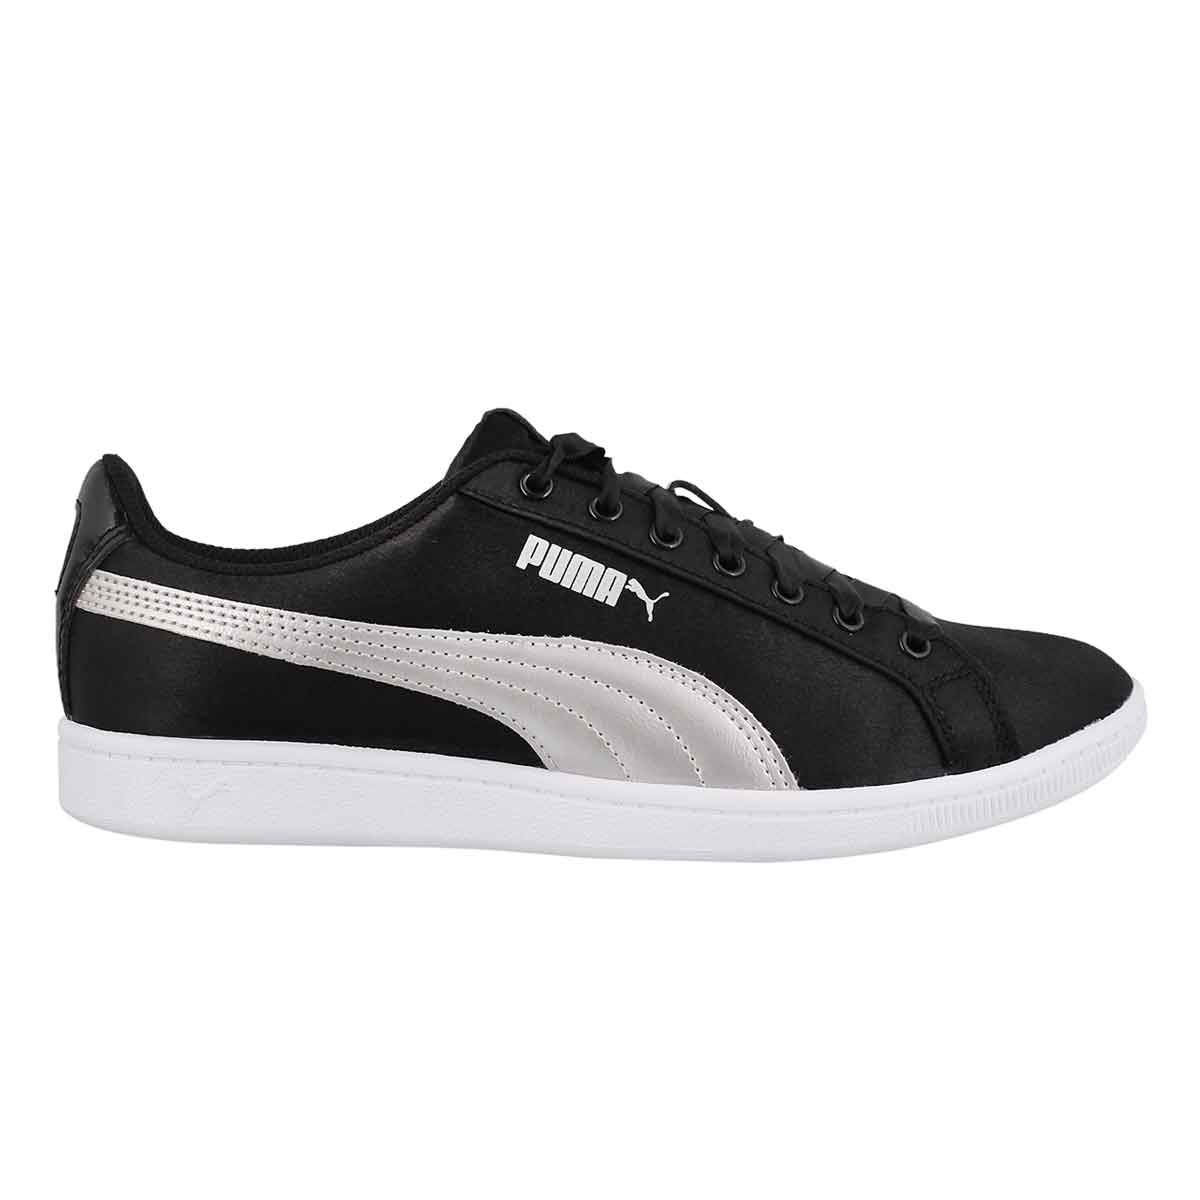 Lds Puma Vikky black/silver sneaker